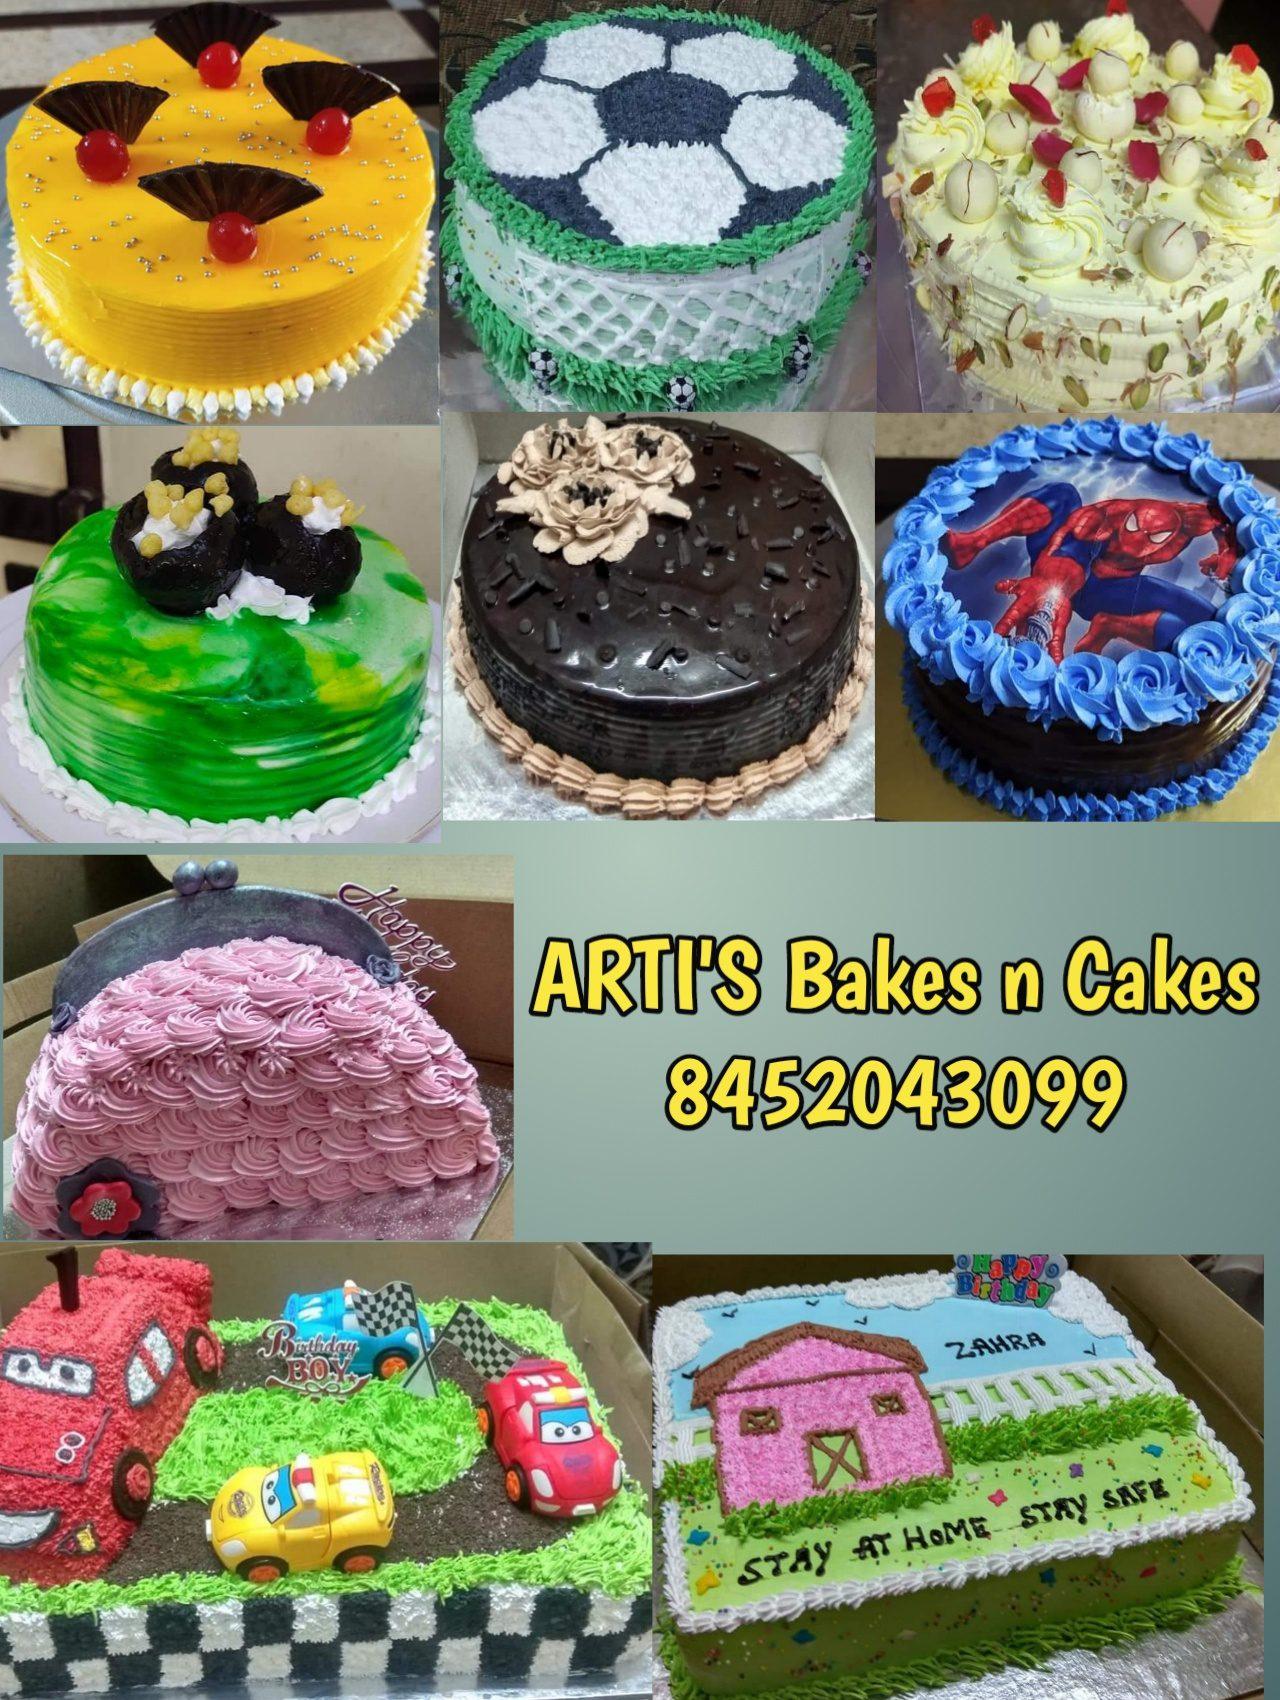 Arti's Bakes n Cakes